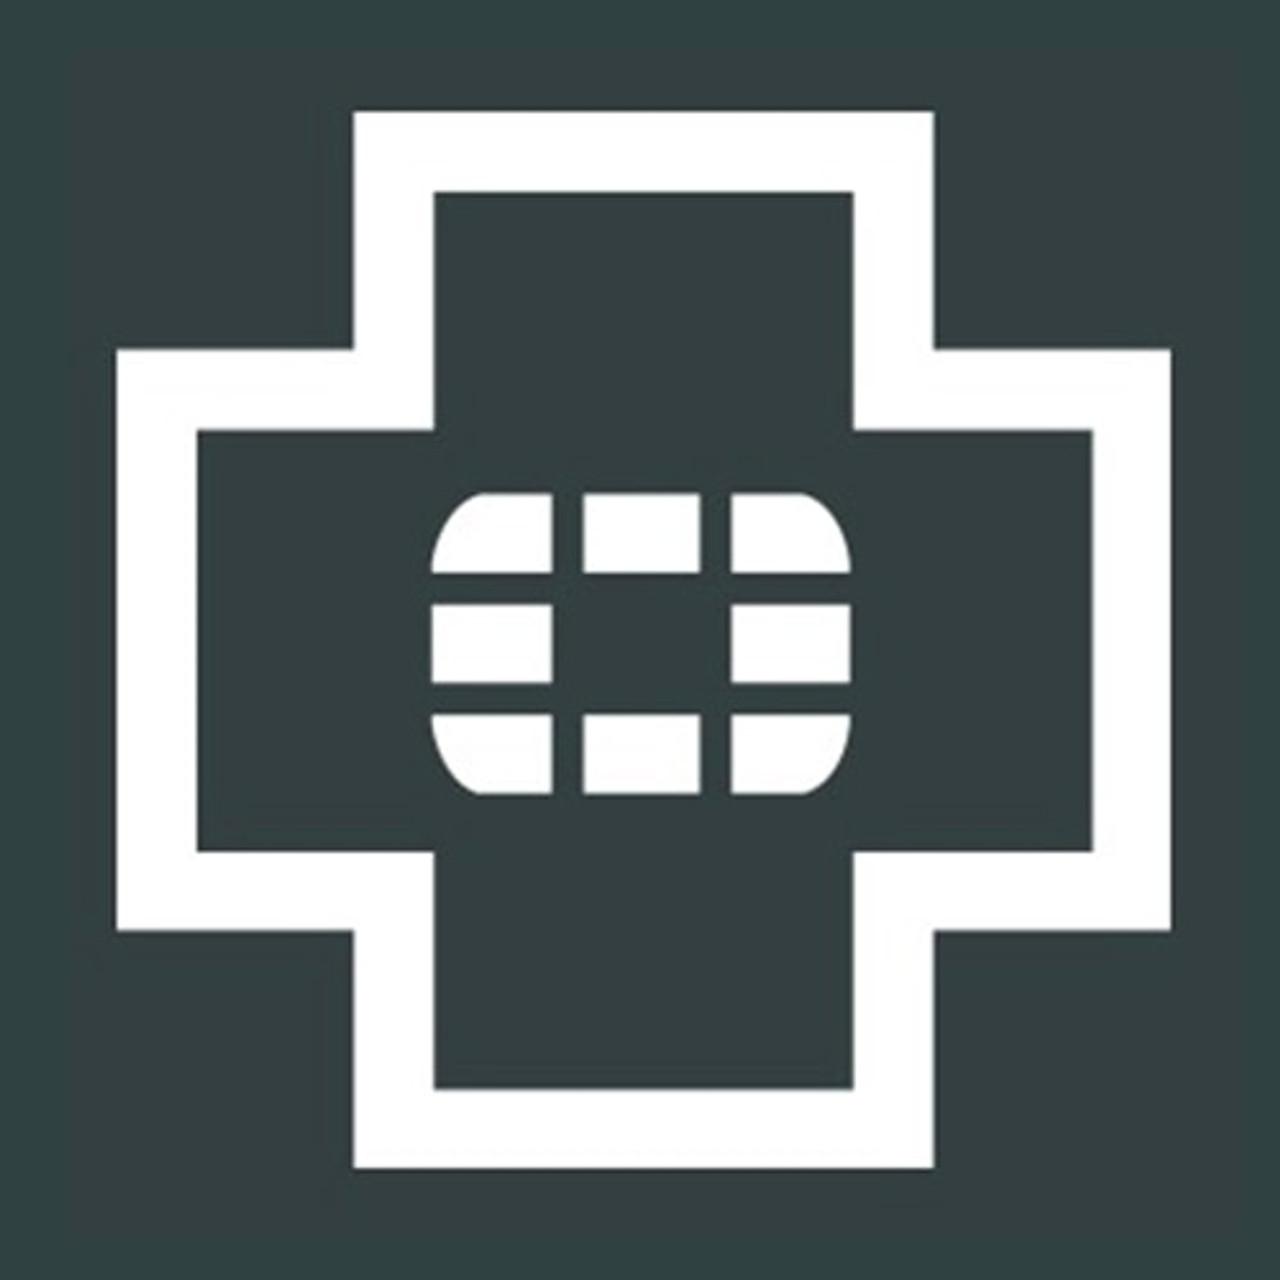 FortiGate-101E - 8x5 FortiCare Contract - 36 months